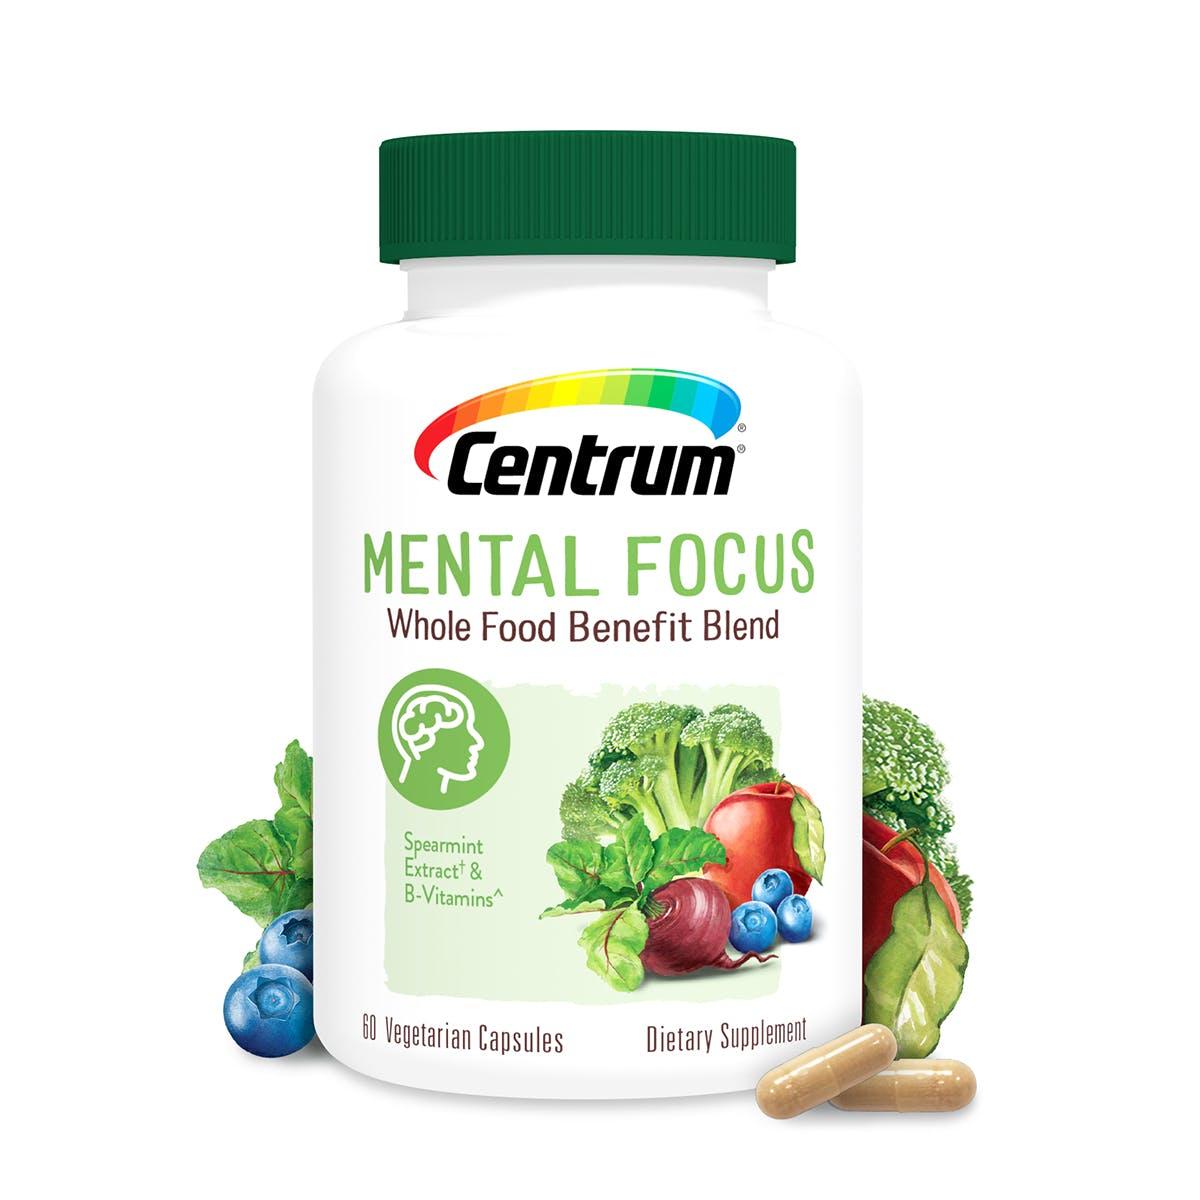 Bottle of Centrum Mental Focus Whole Food Blend Multivitamin